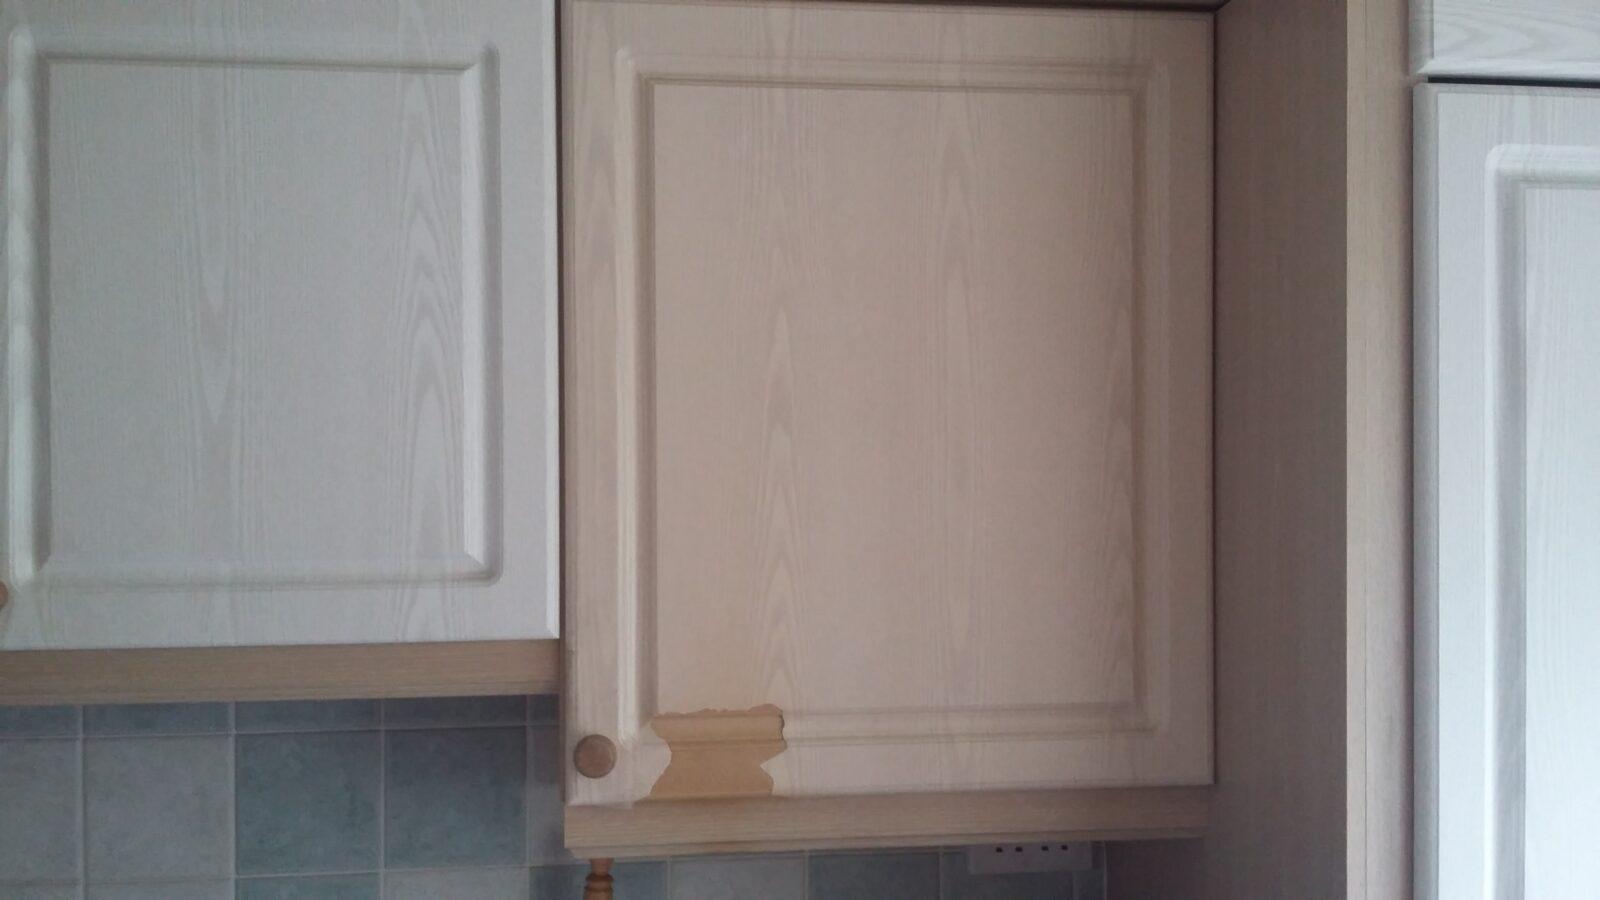 Toaster Burn Kitchen Cupboard Door Repair Namco Refurbs